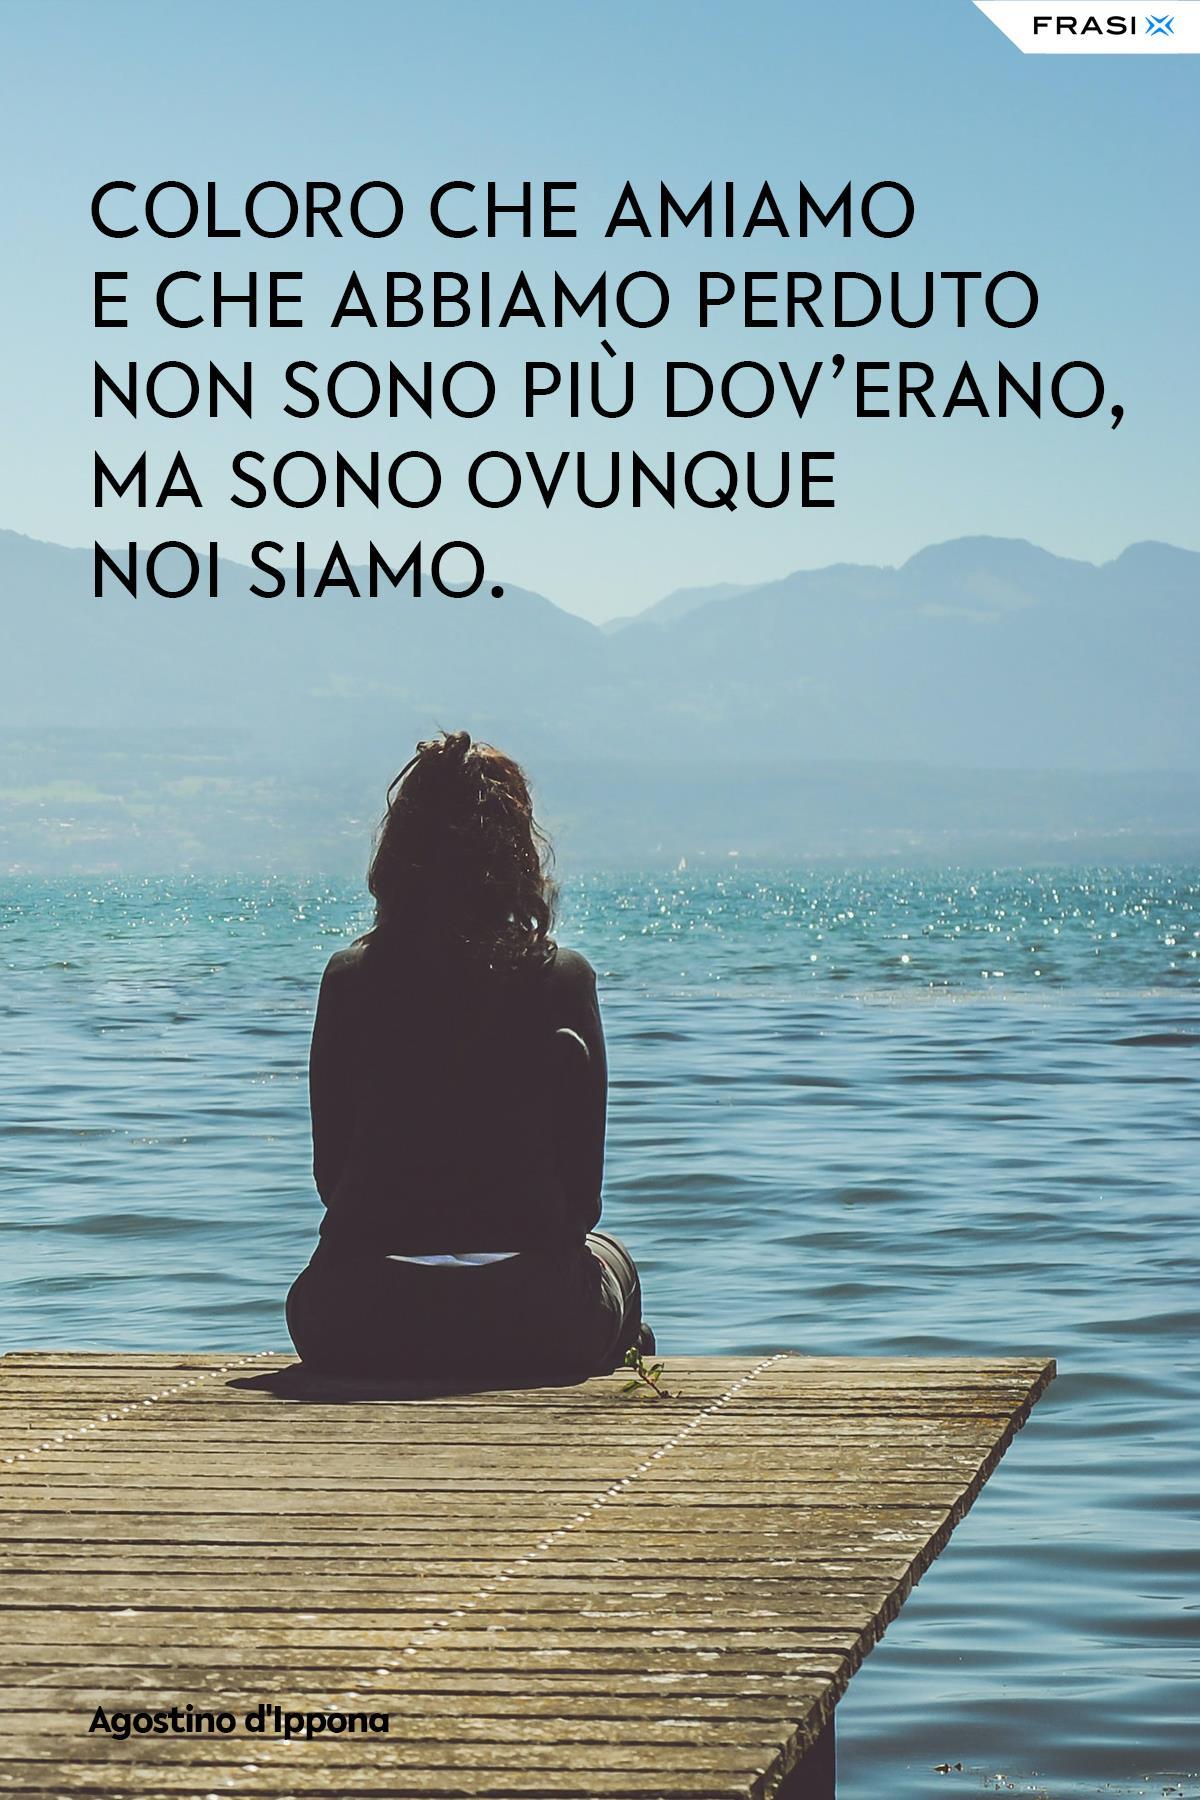 Frasi depresse amore Agostino d'Ippona